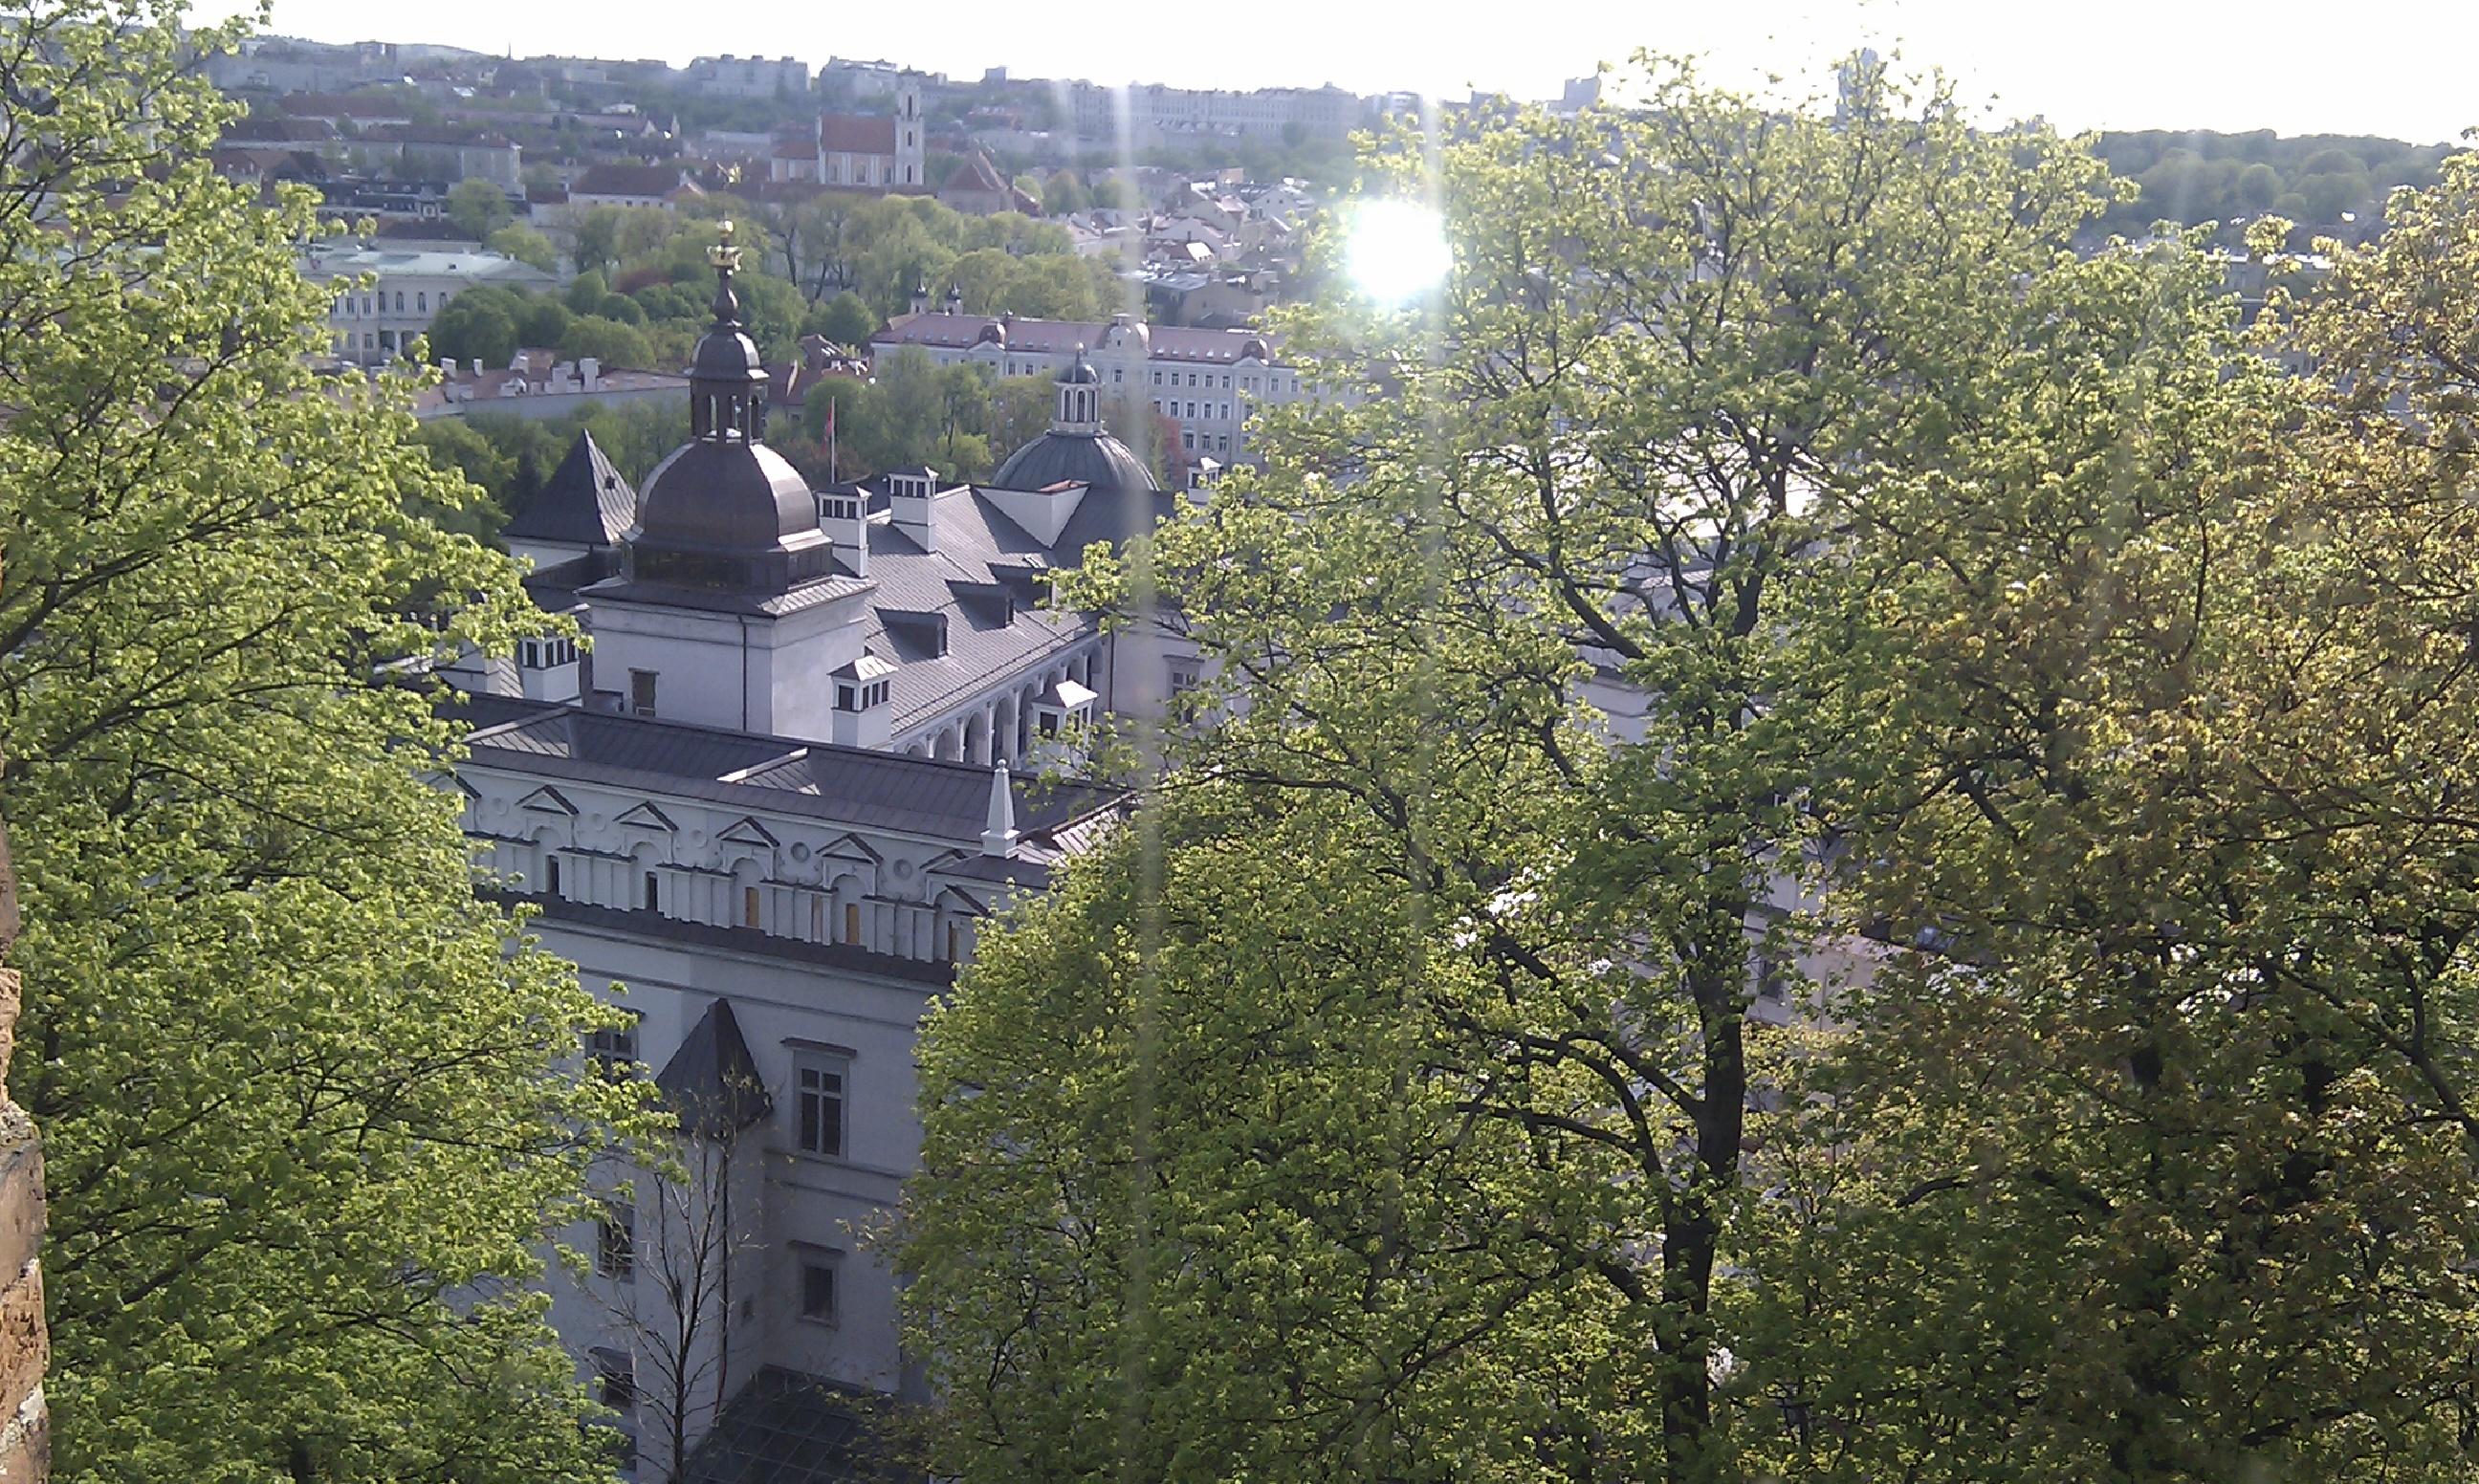 Immobilien Litauen kostenlose foto baum chateau historisch unesco immobilien